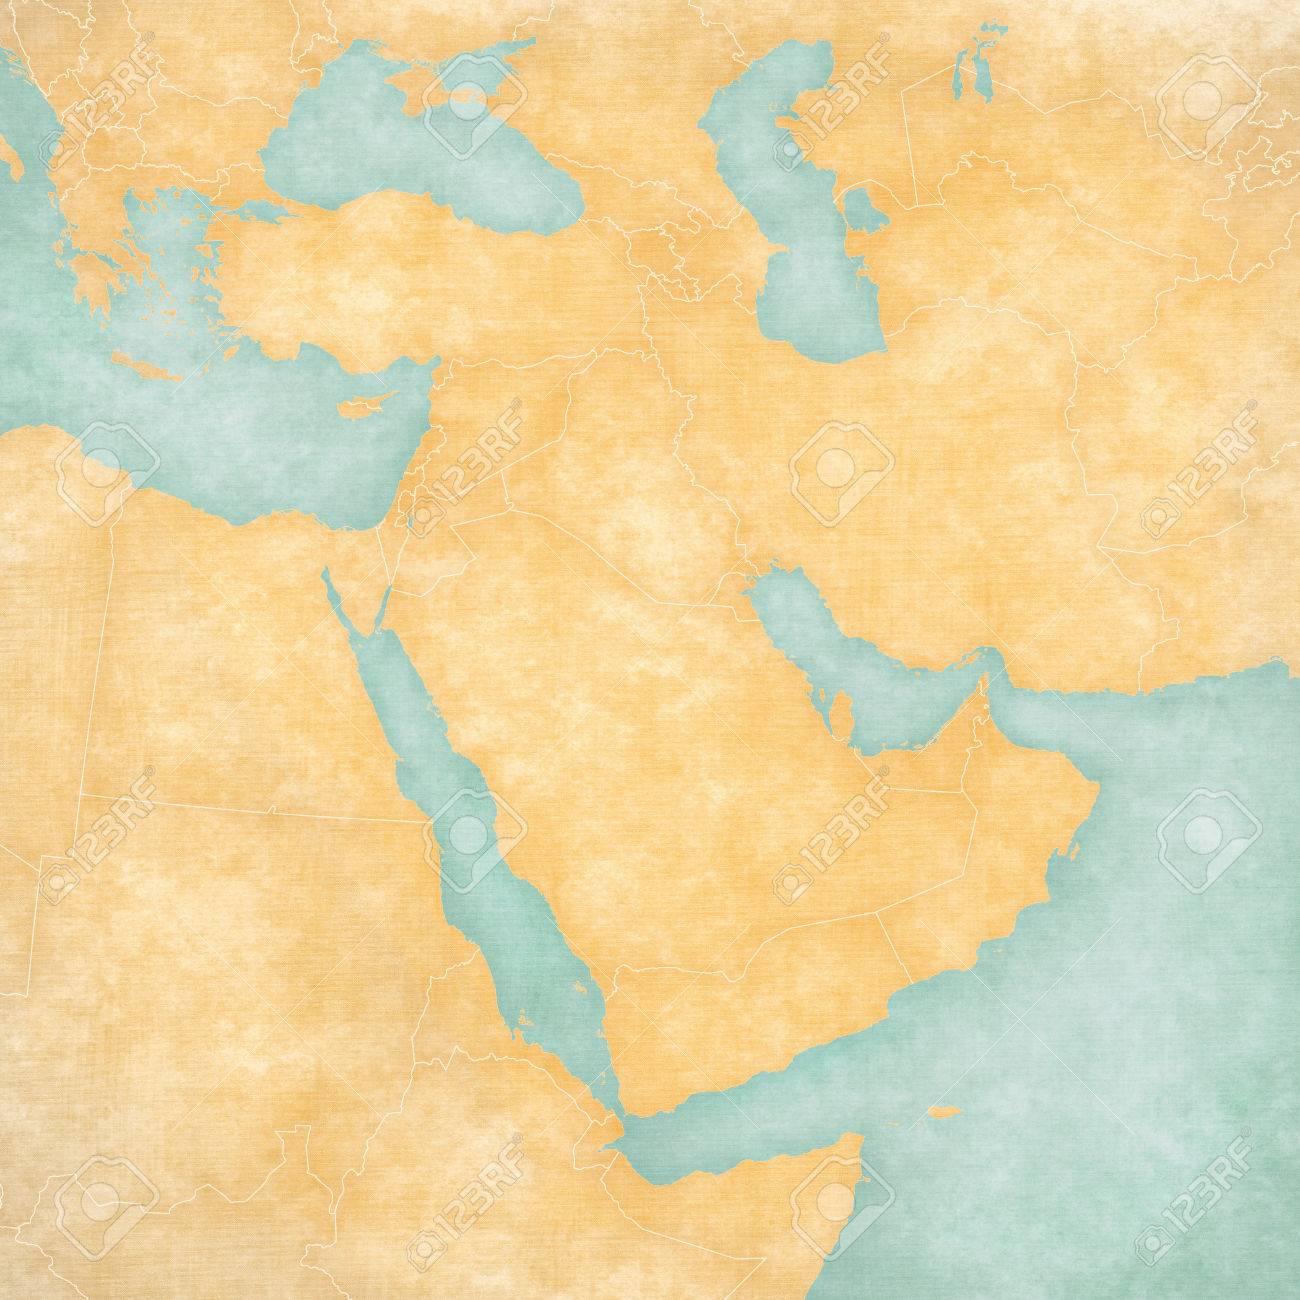 Carte Asie Vierge.Carte Vierge Du Moyen Orient Asie Occidentale Avec Des Frontieres